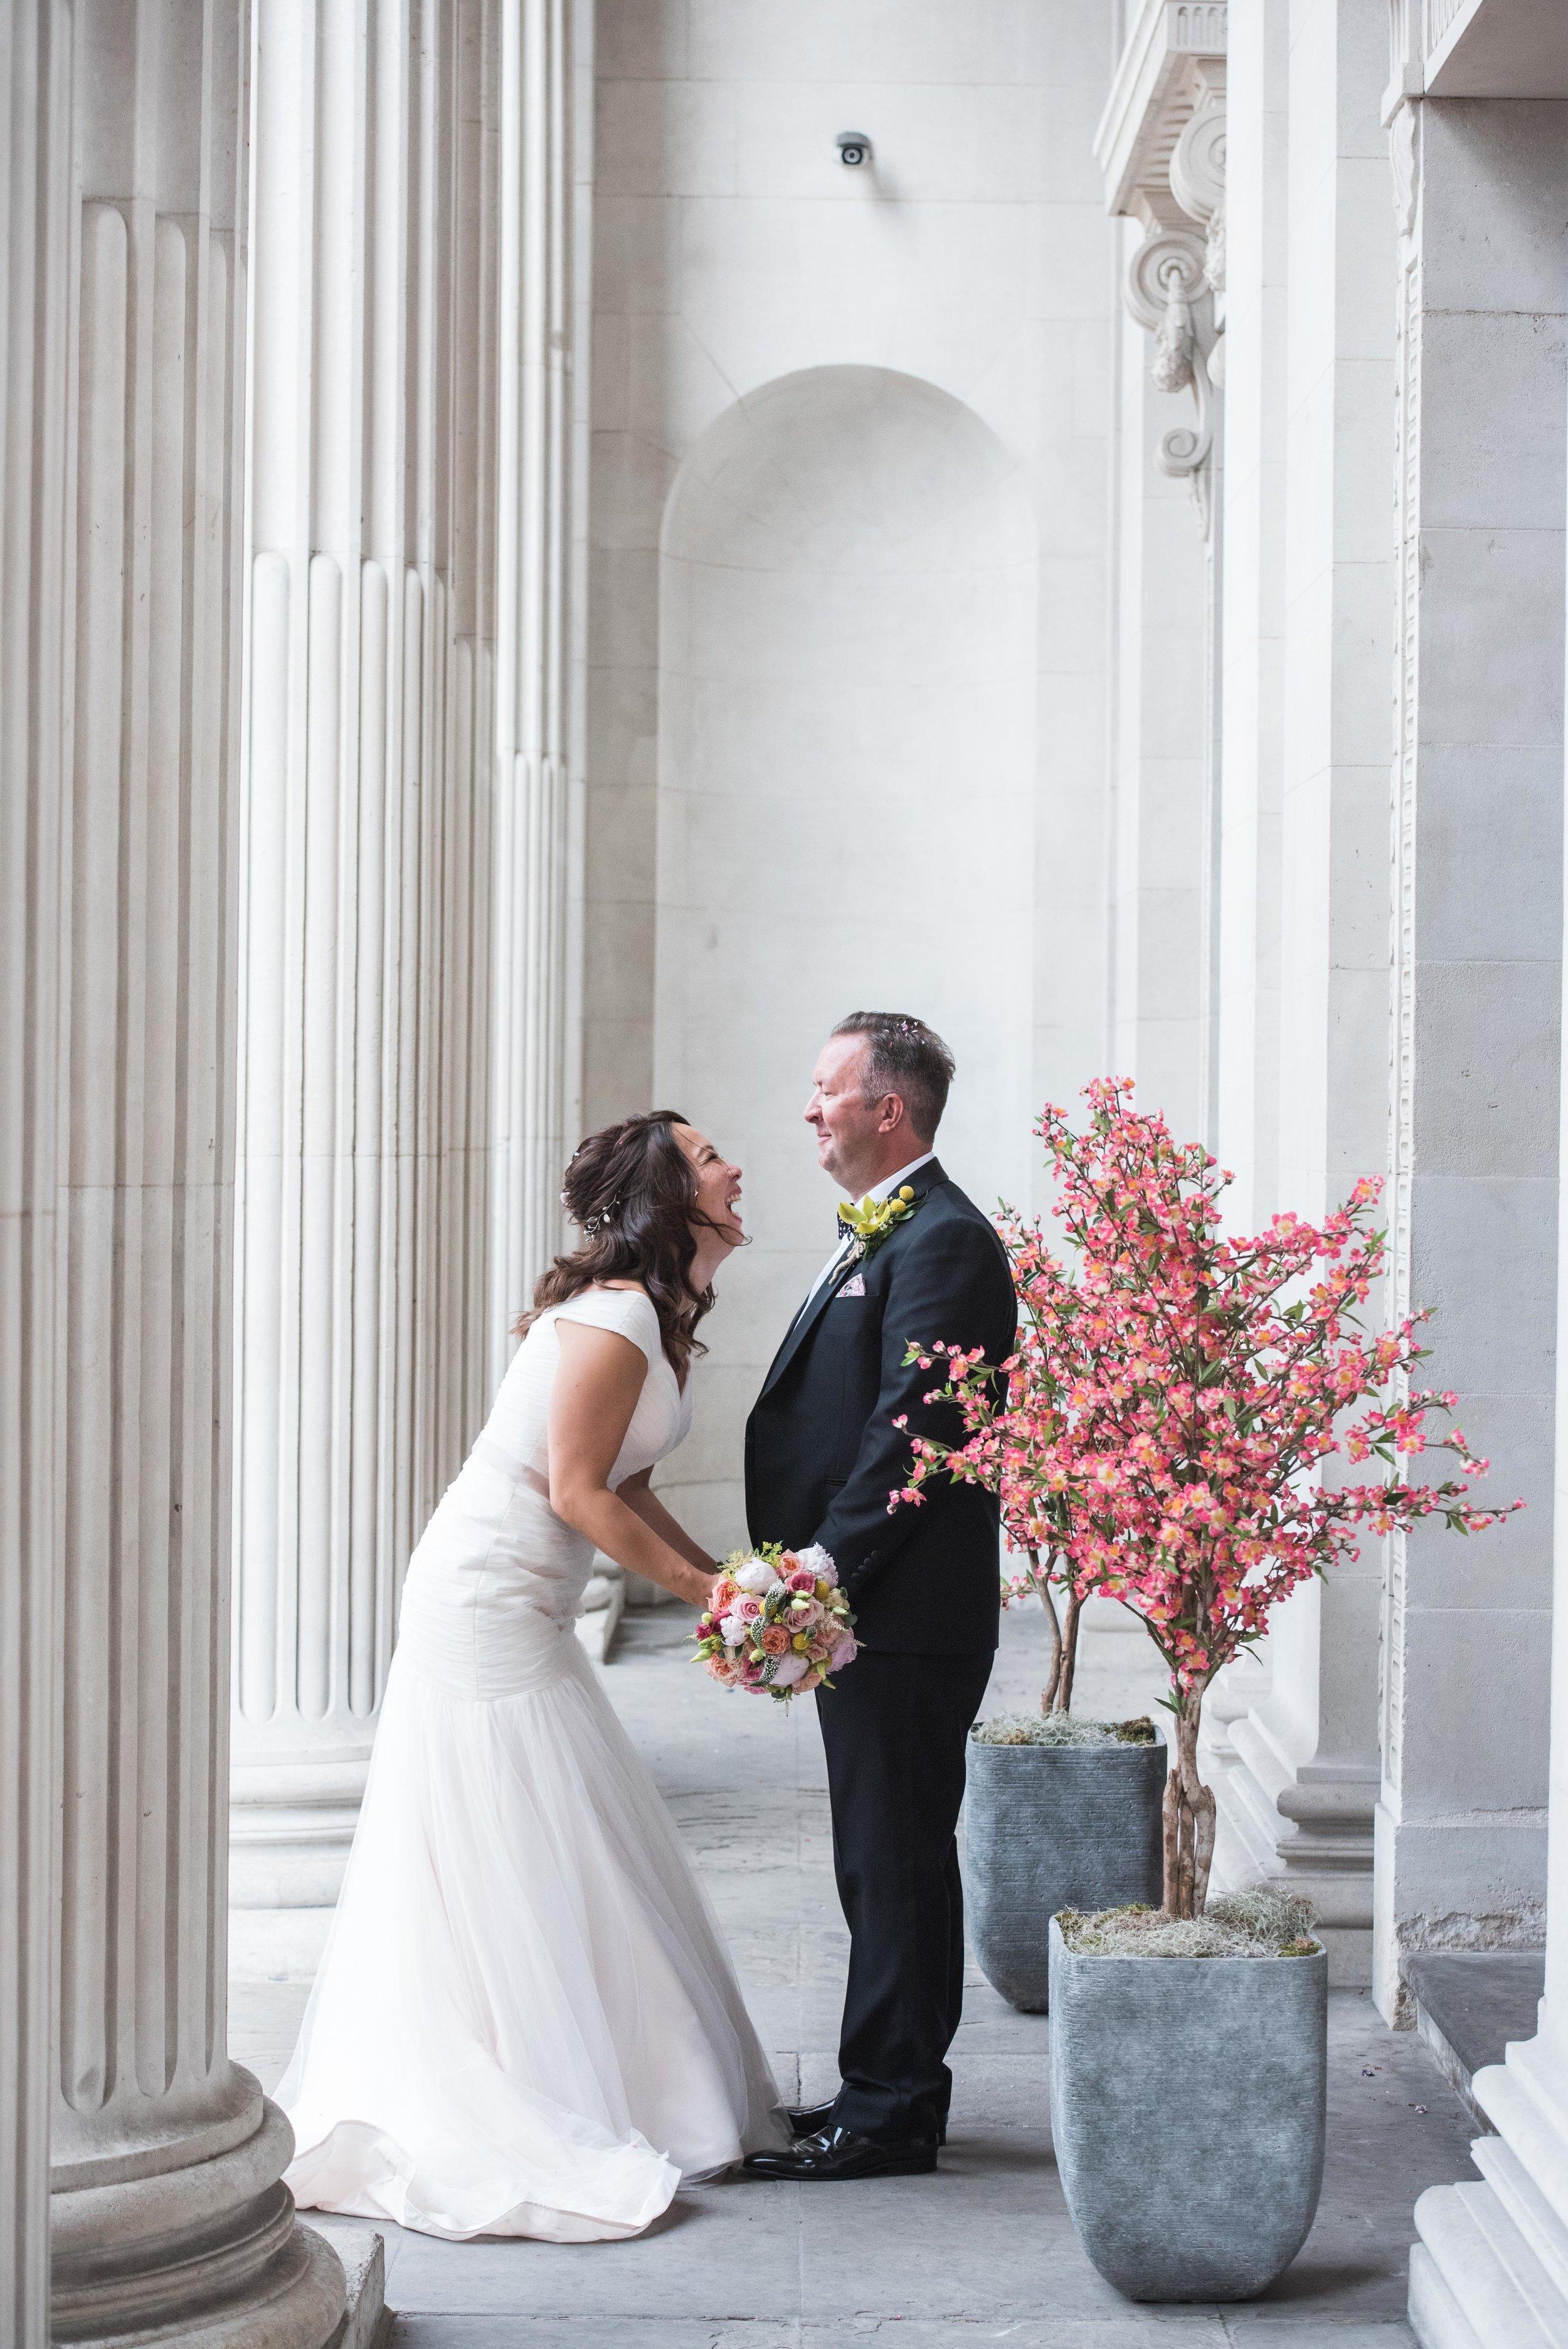 D&M_Marylebone Town Hall Wedding (143 of 239).jpg